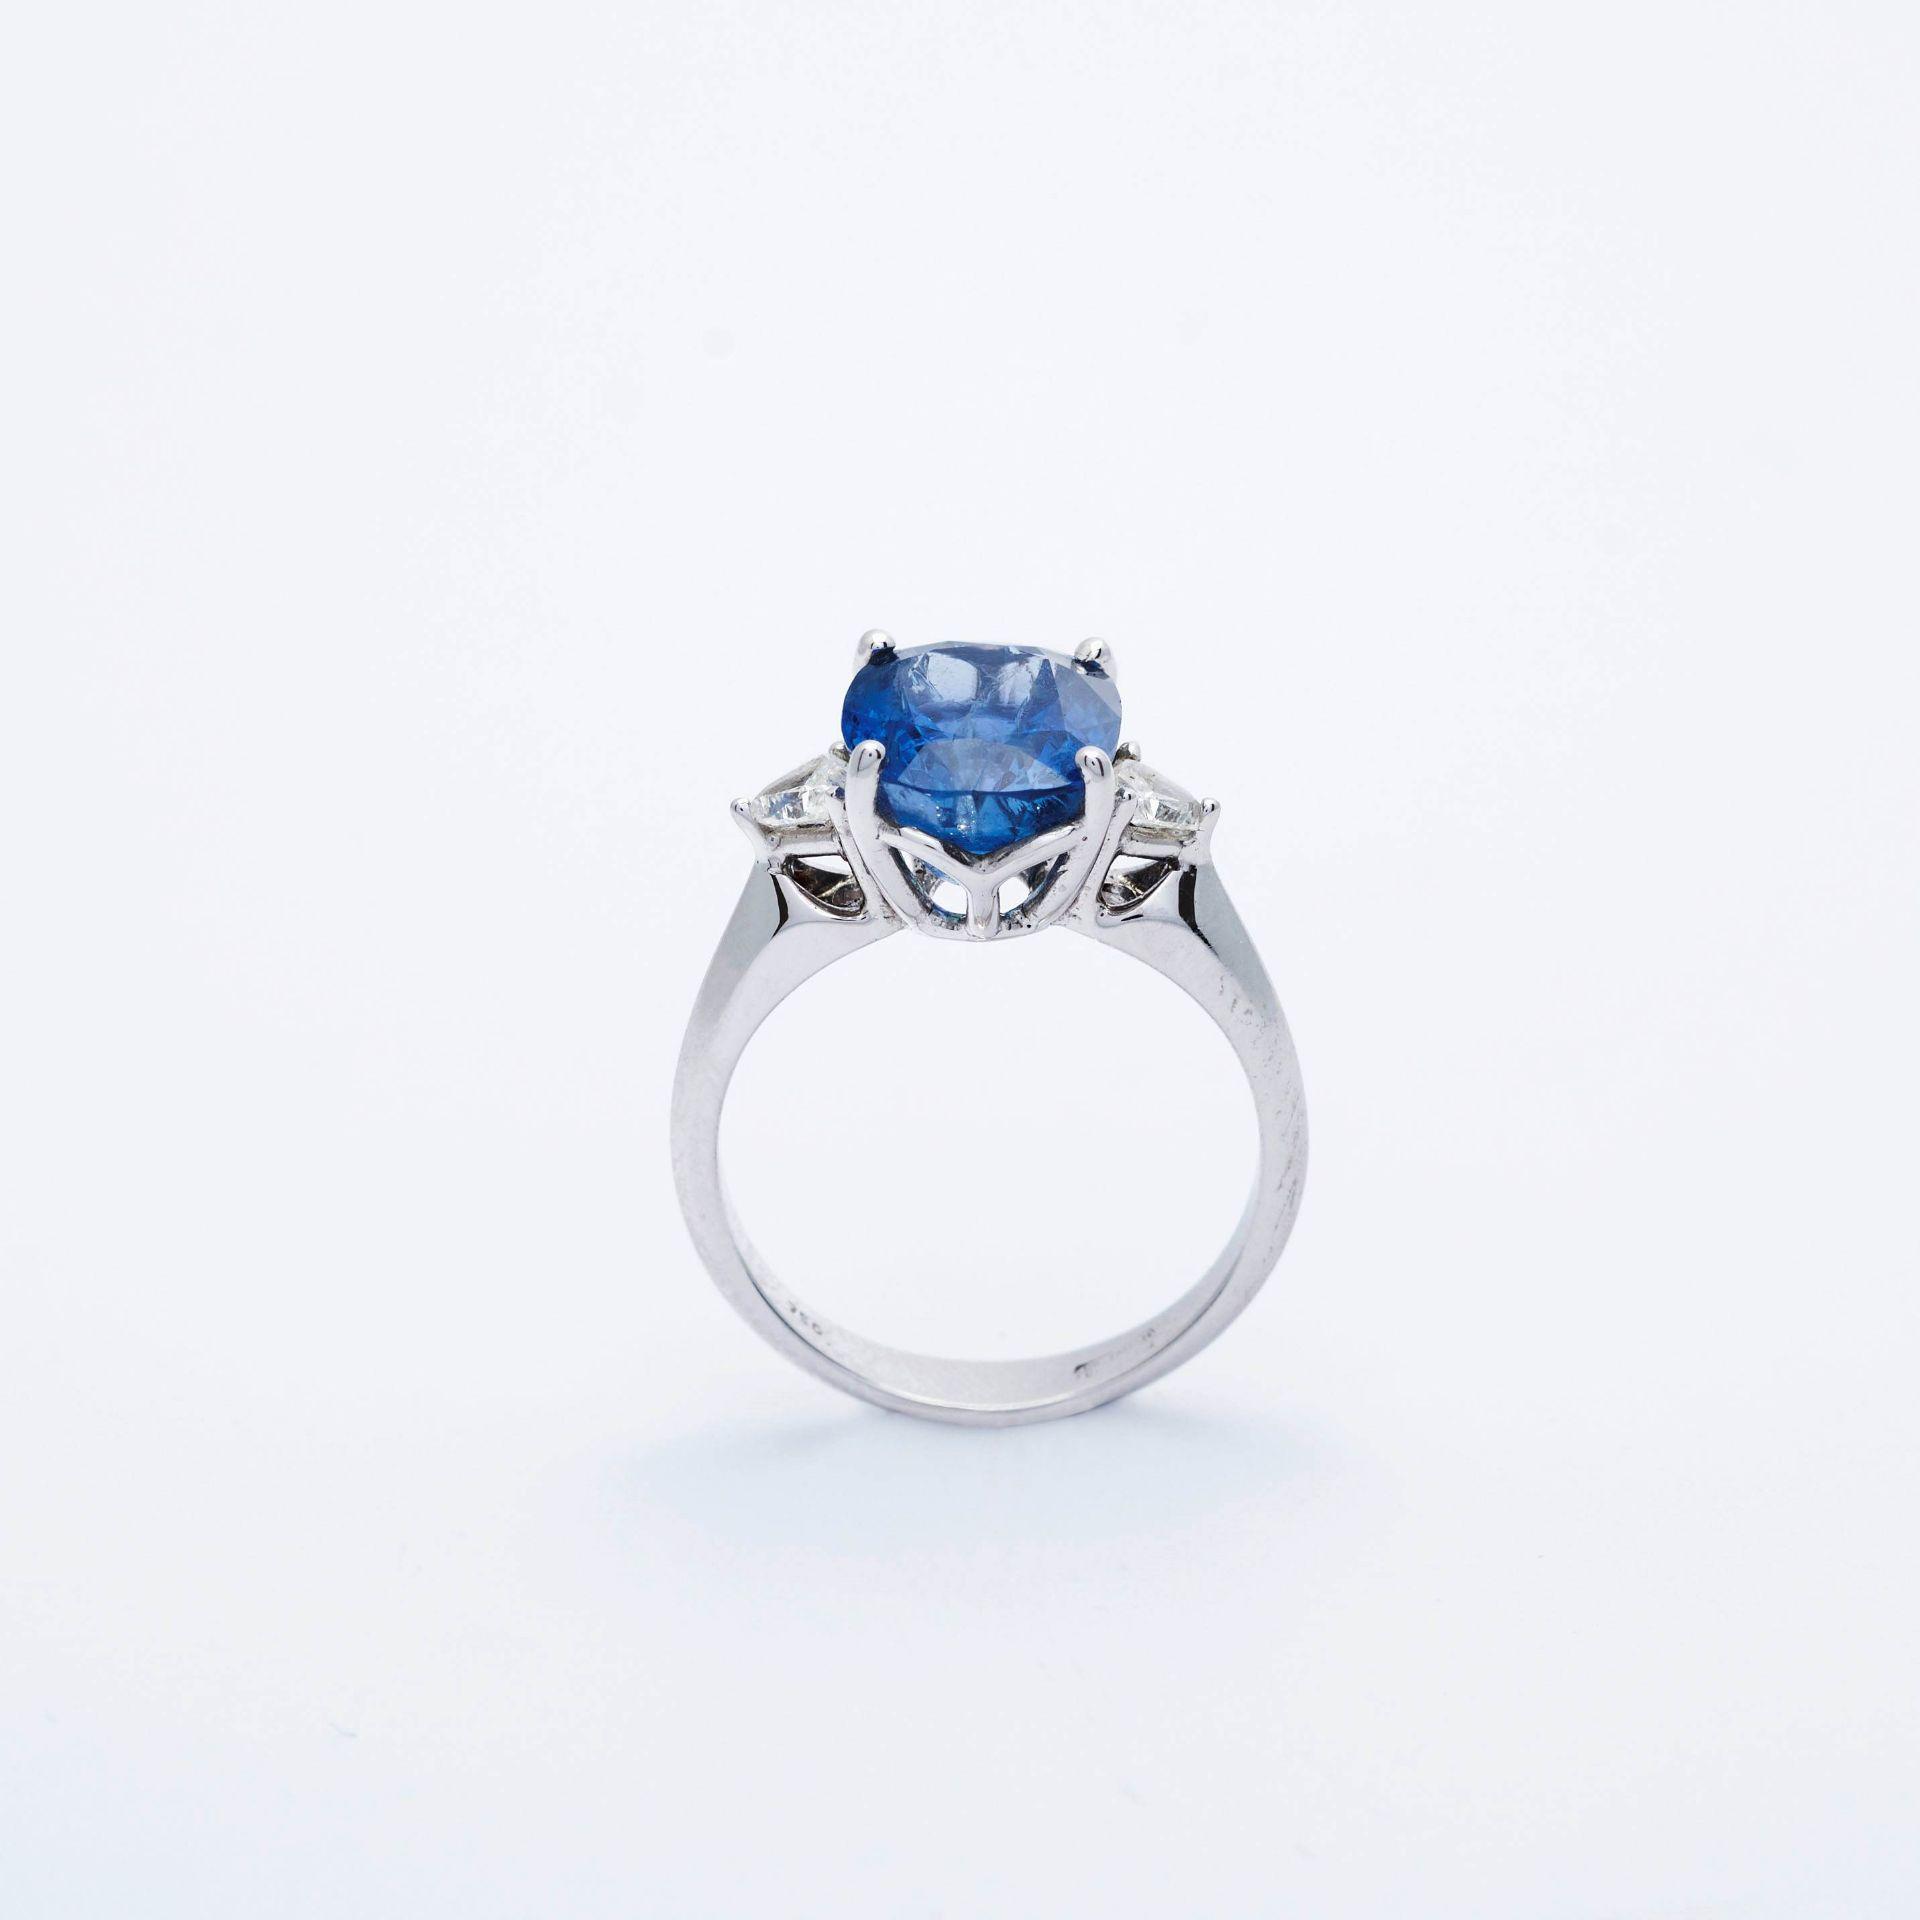 BURMA SAPPHIRE AND DIAMOND RING. - Image 4 of 5